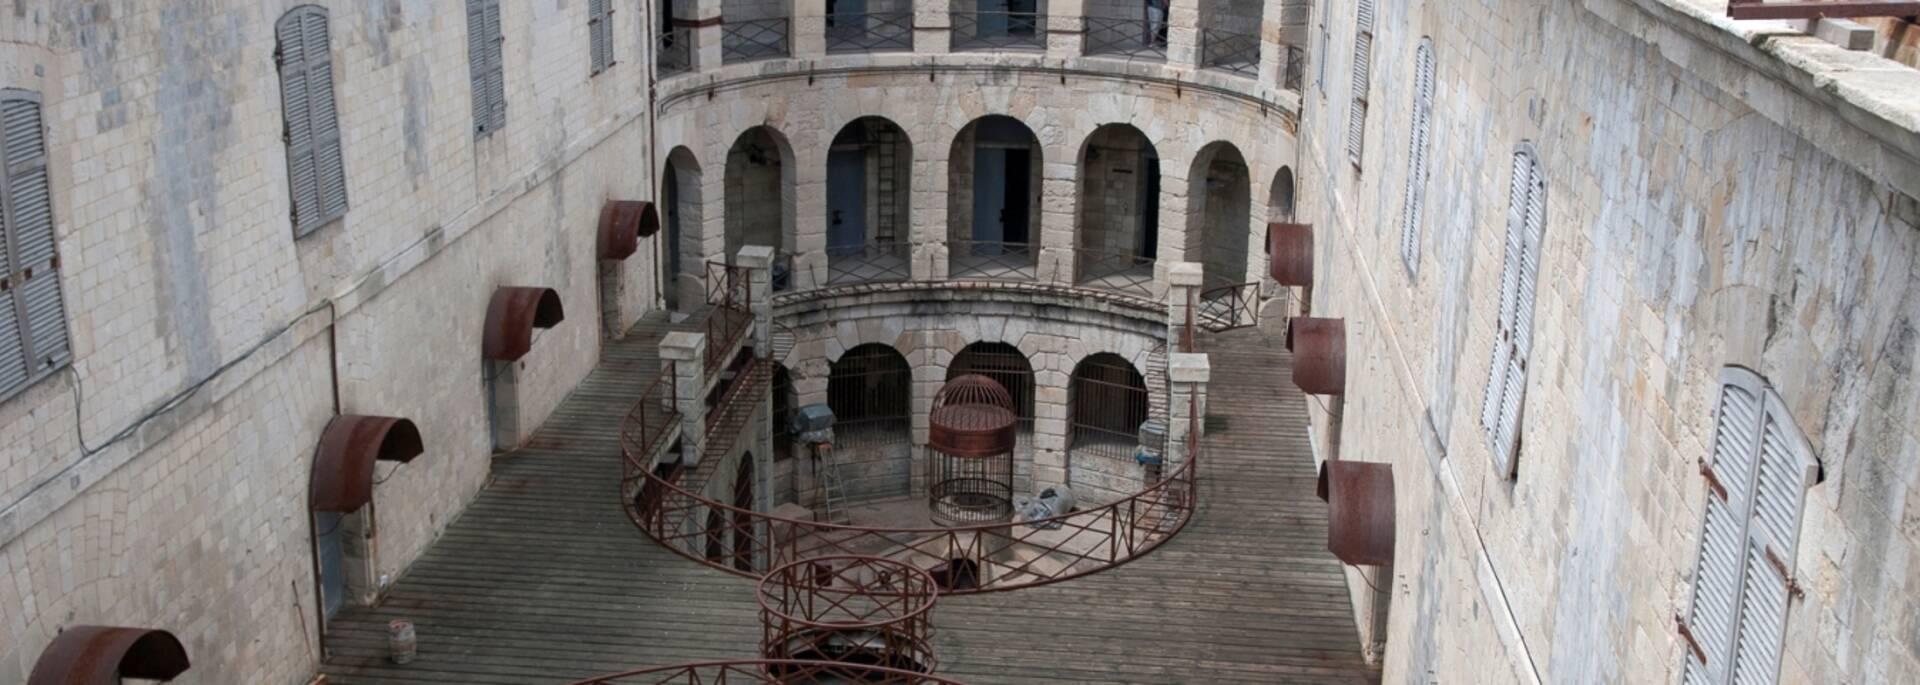 Inside the Fort Boyard - © Marie-Françoise Boufflet